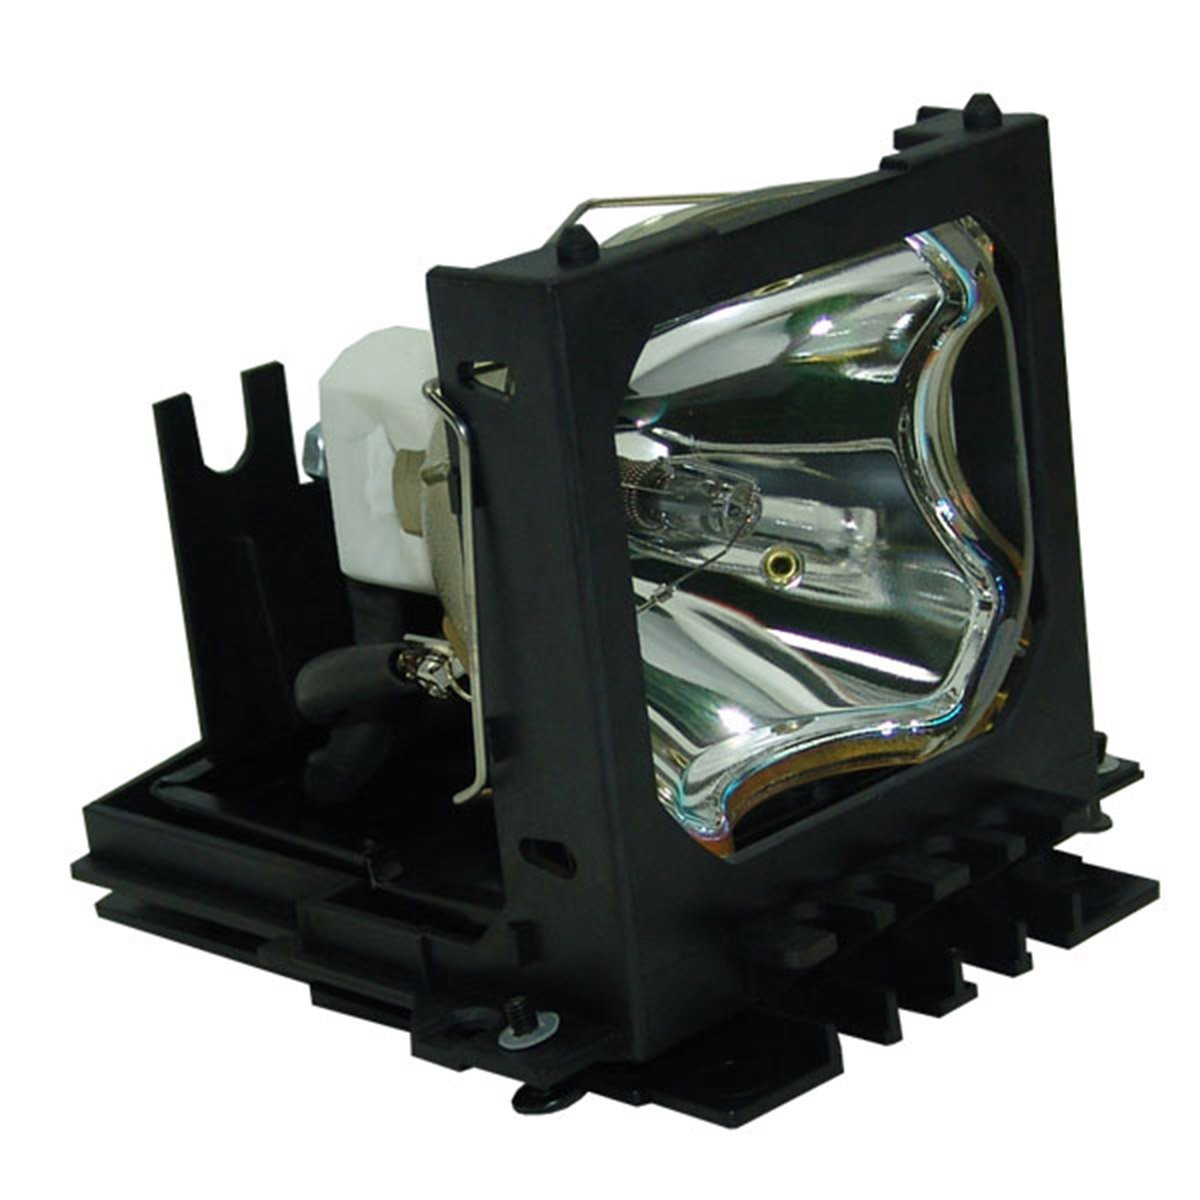 LucentBulb InFocus DP-8500X ランプキャリッジ B07NZFLJ34